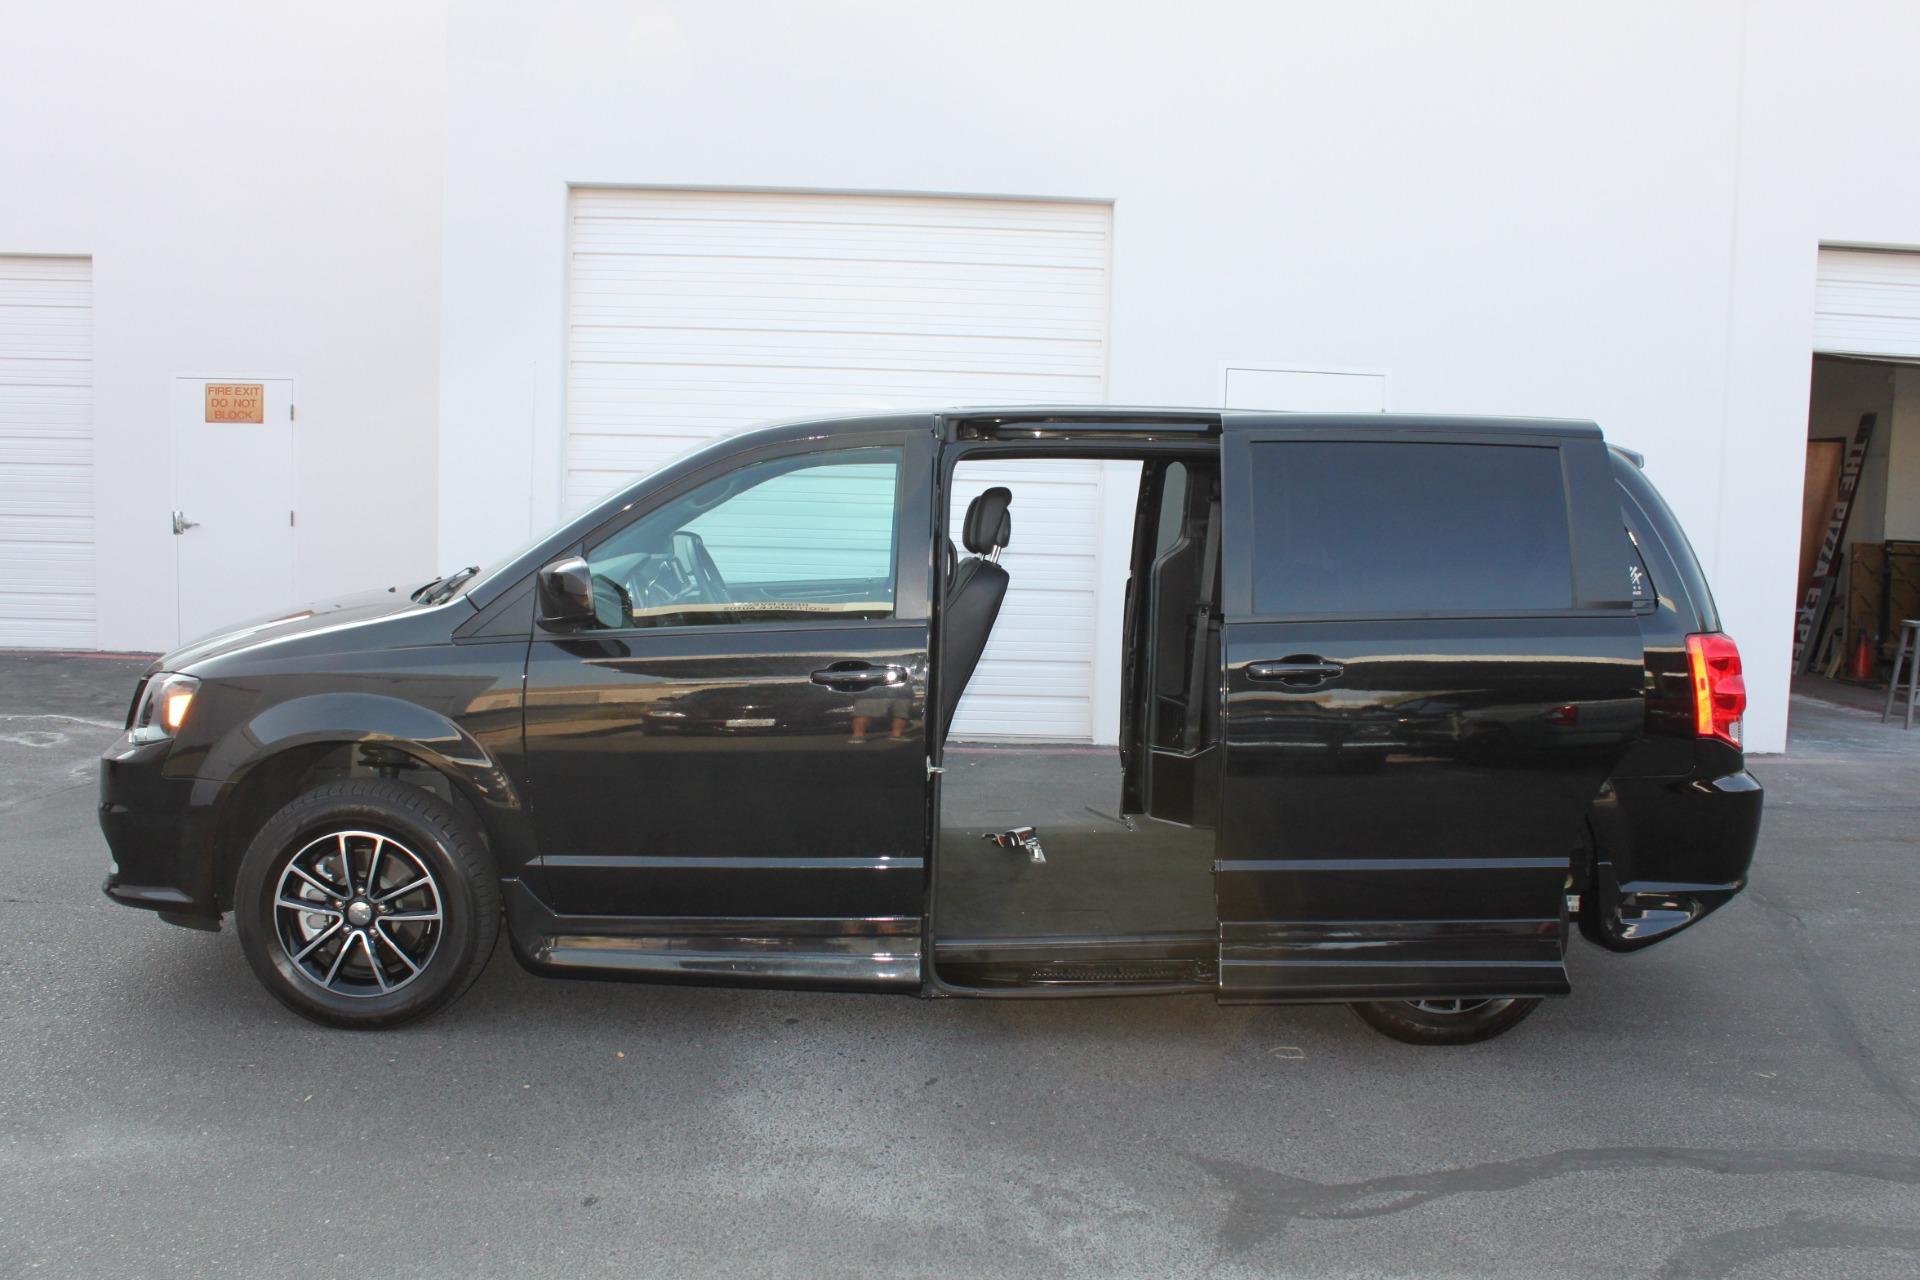 Used-2018-Dodge-Grand-Caravan-SXT-Rollx-Mobility-Conversion-LS430